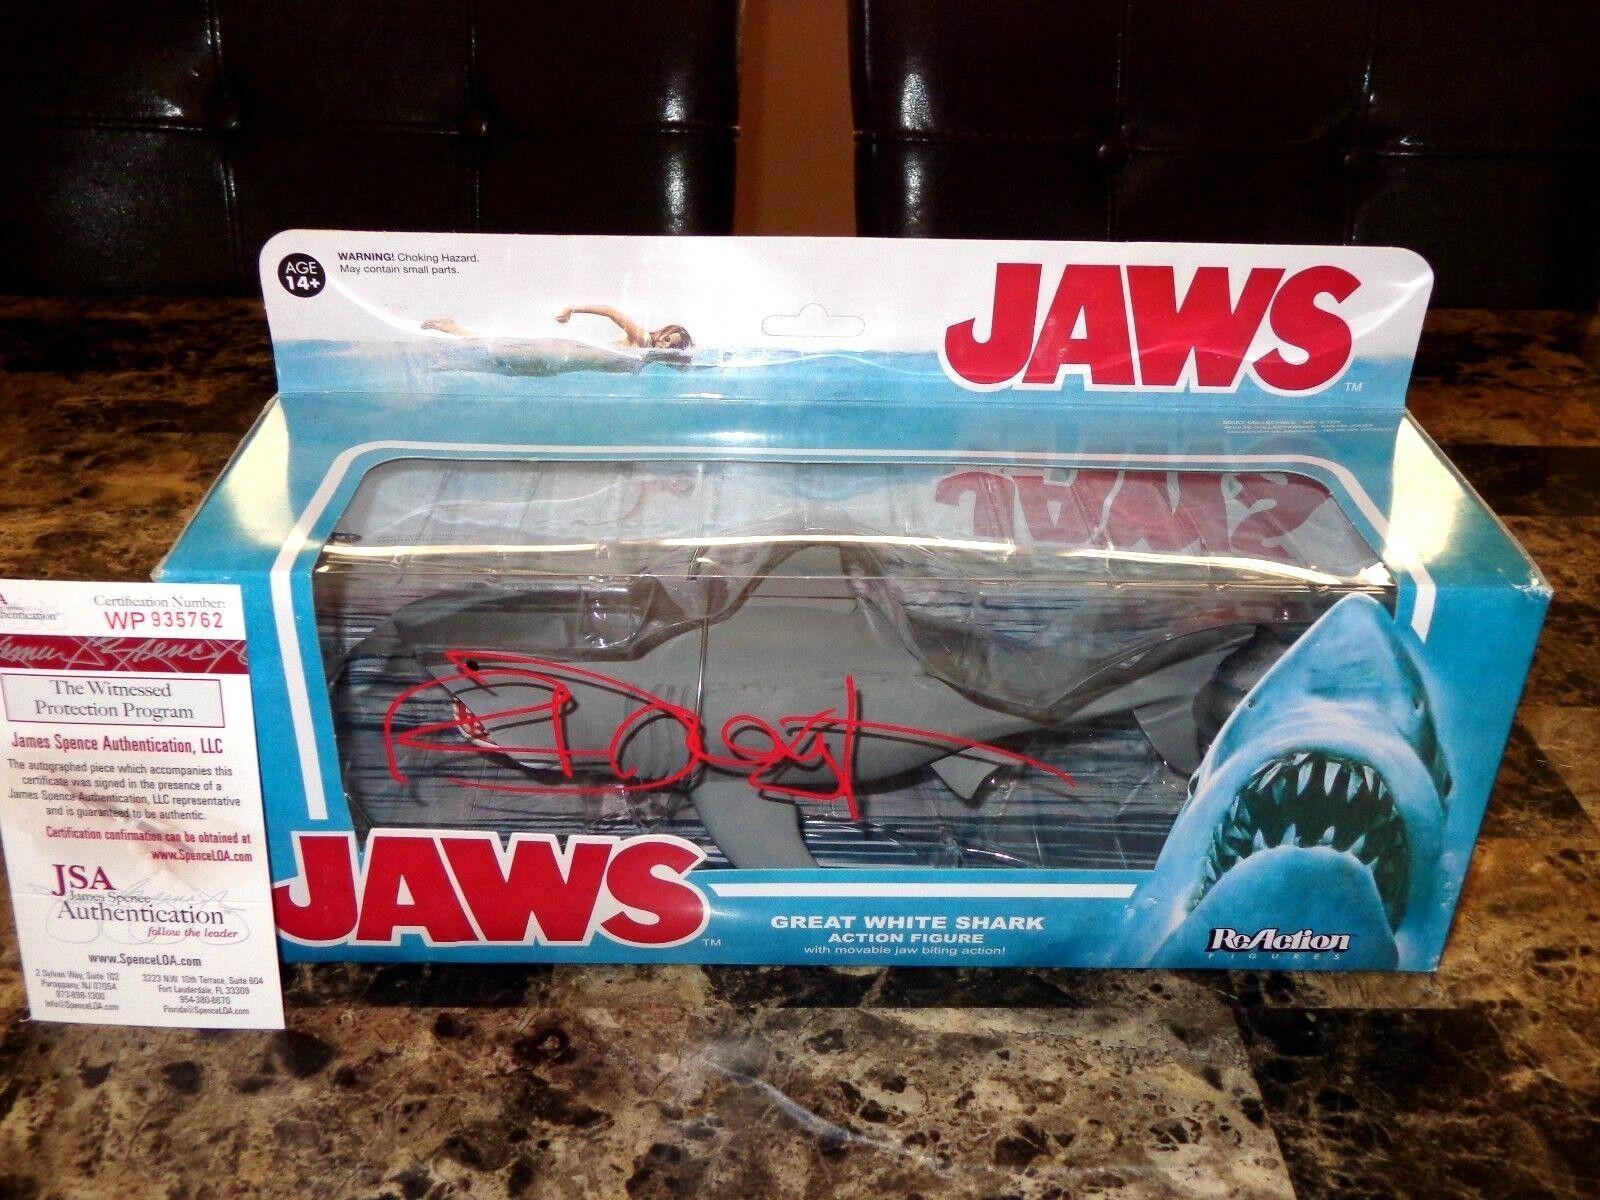 Jaws Rare Richard Dreyfuss Signed Movie Prop Shark ReAction Action Figure + COA